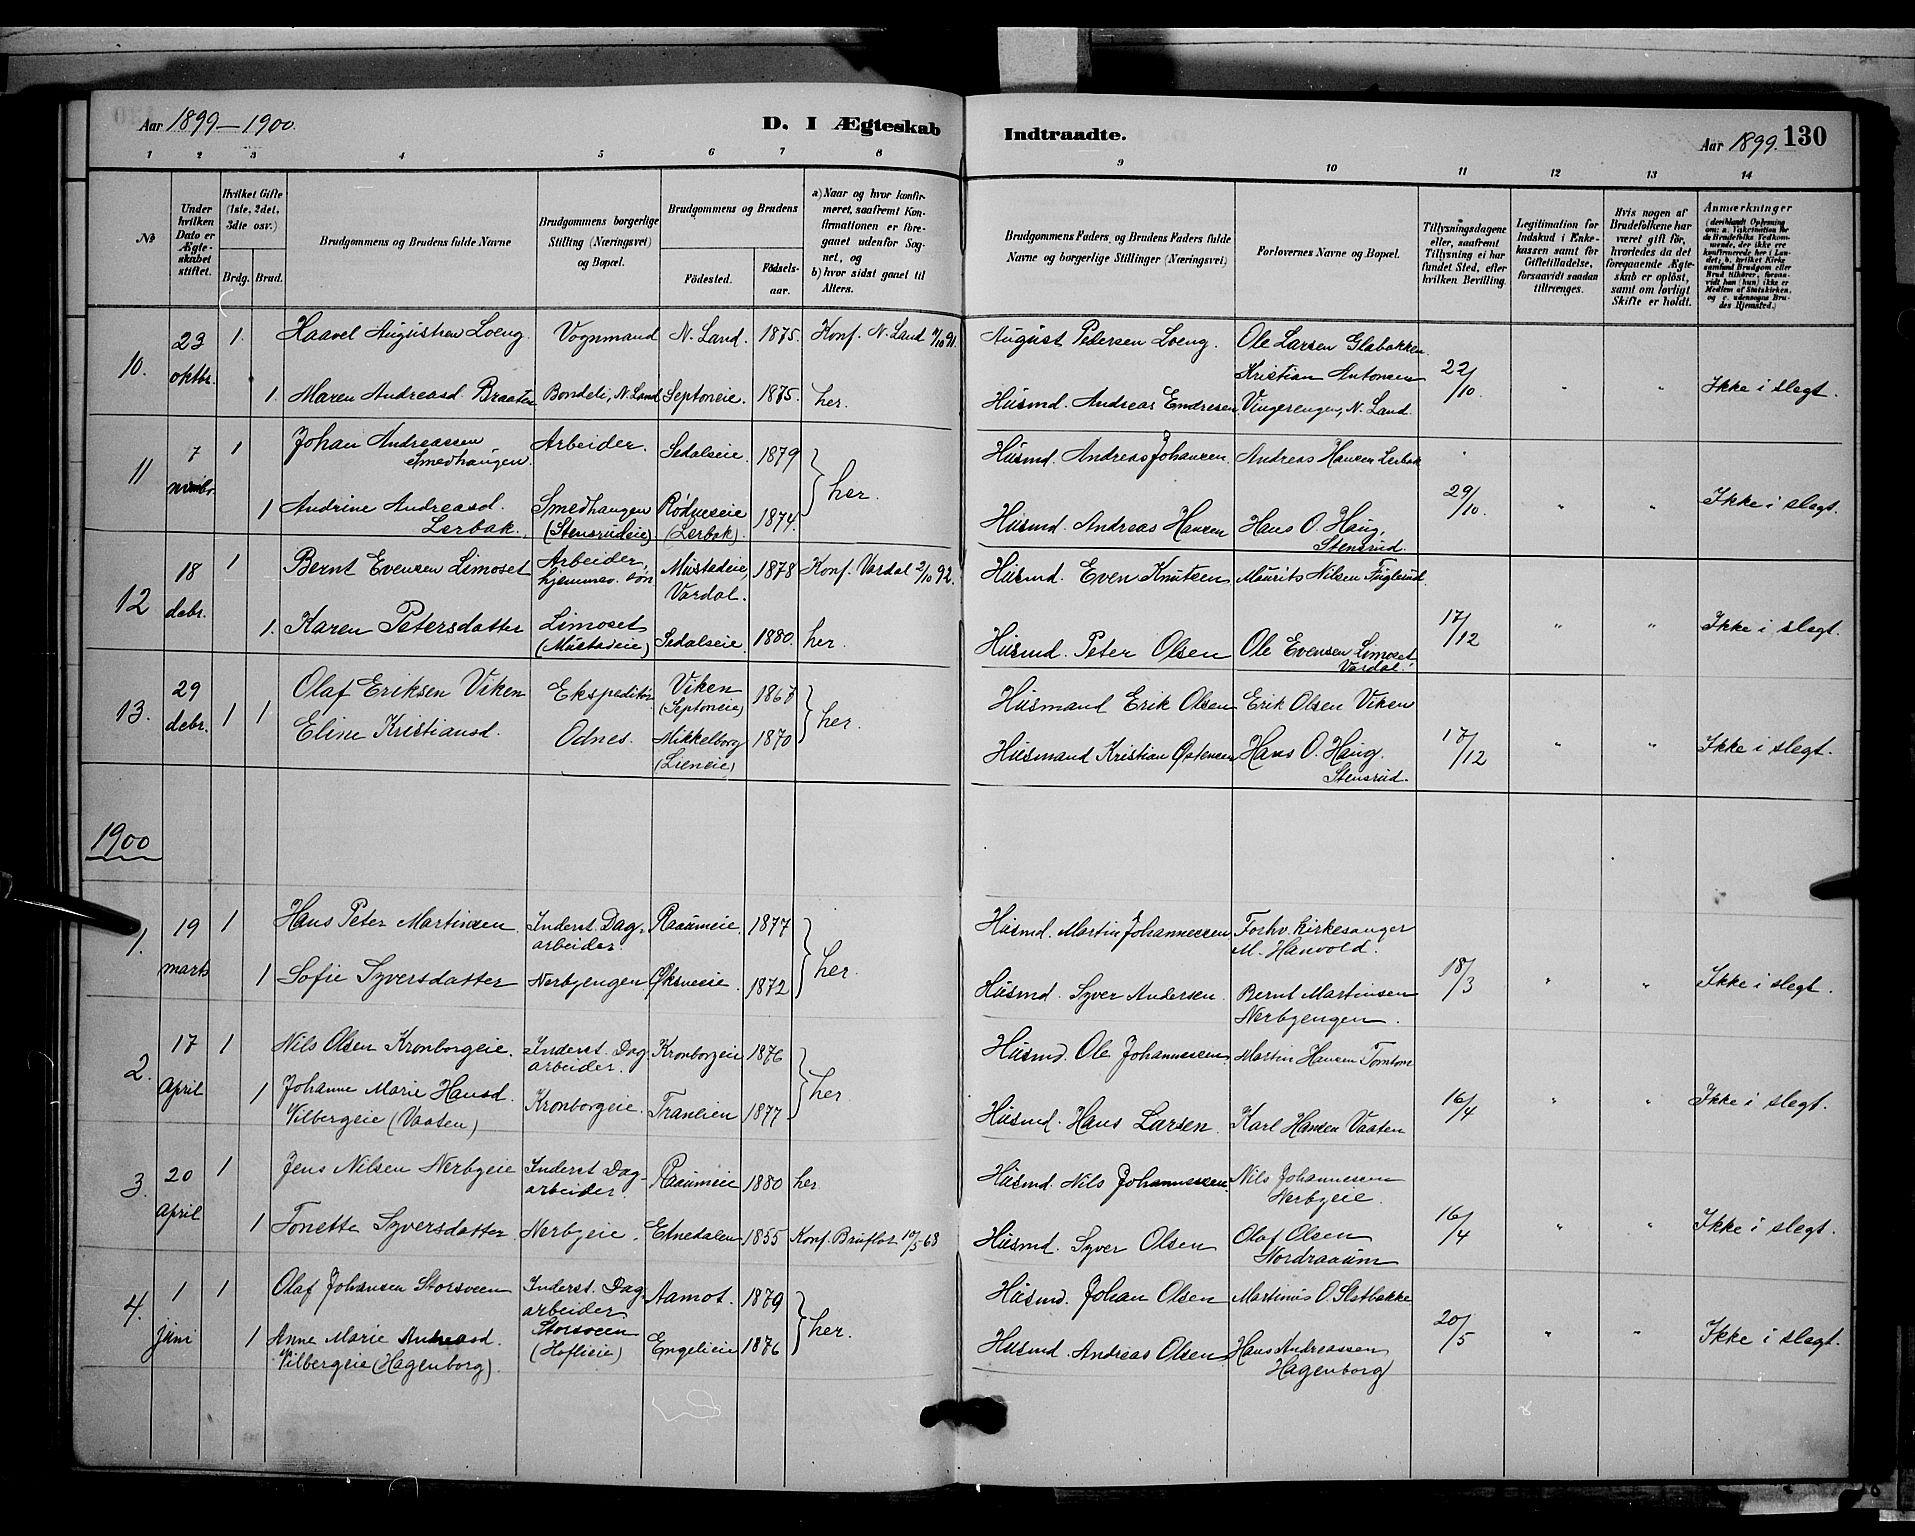 SAH, Søndre Land prestekontor, L/L0003: Klokkerbok nr. 3, 1884-1902, s. 130